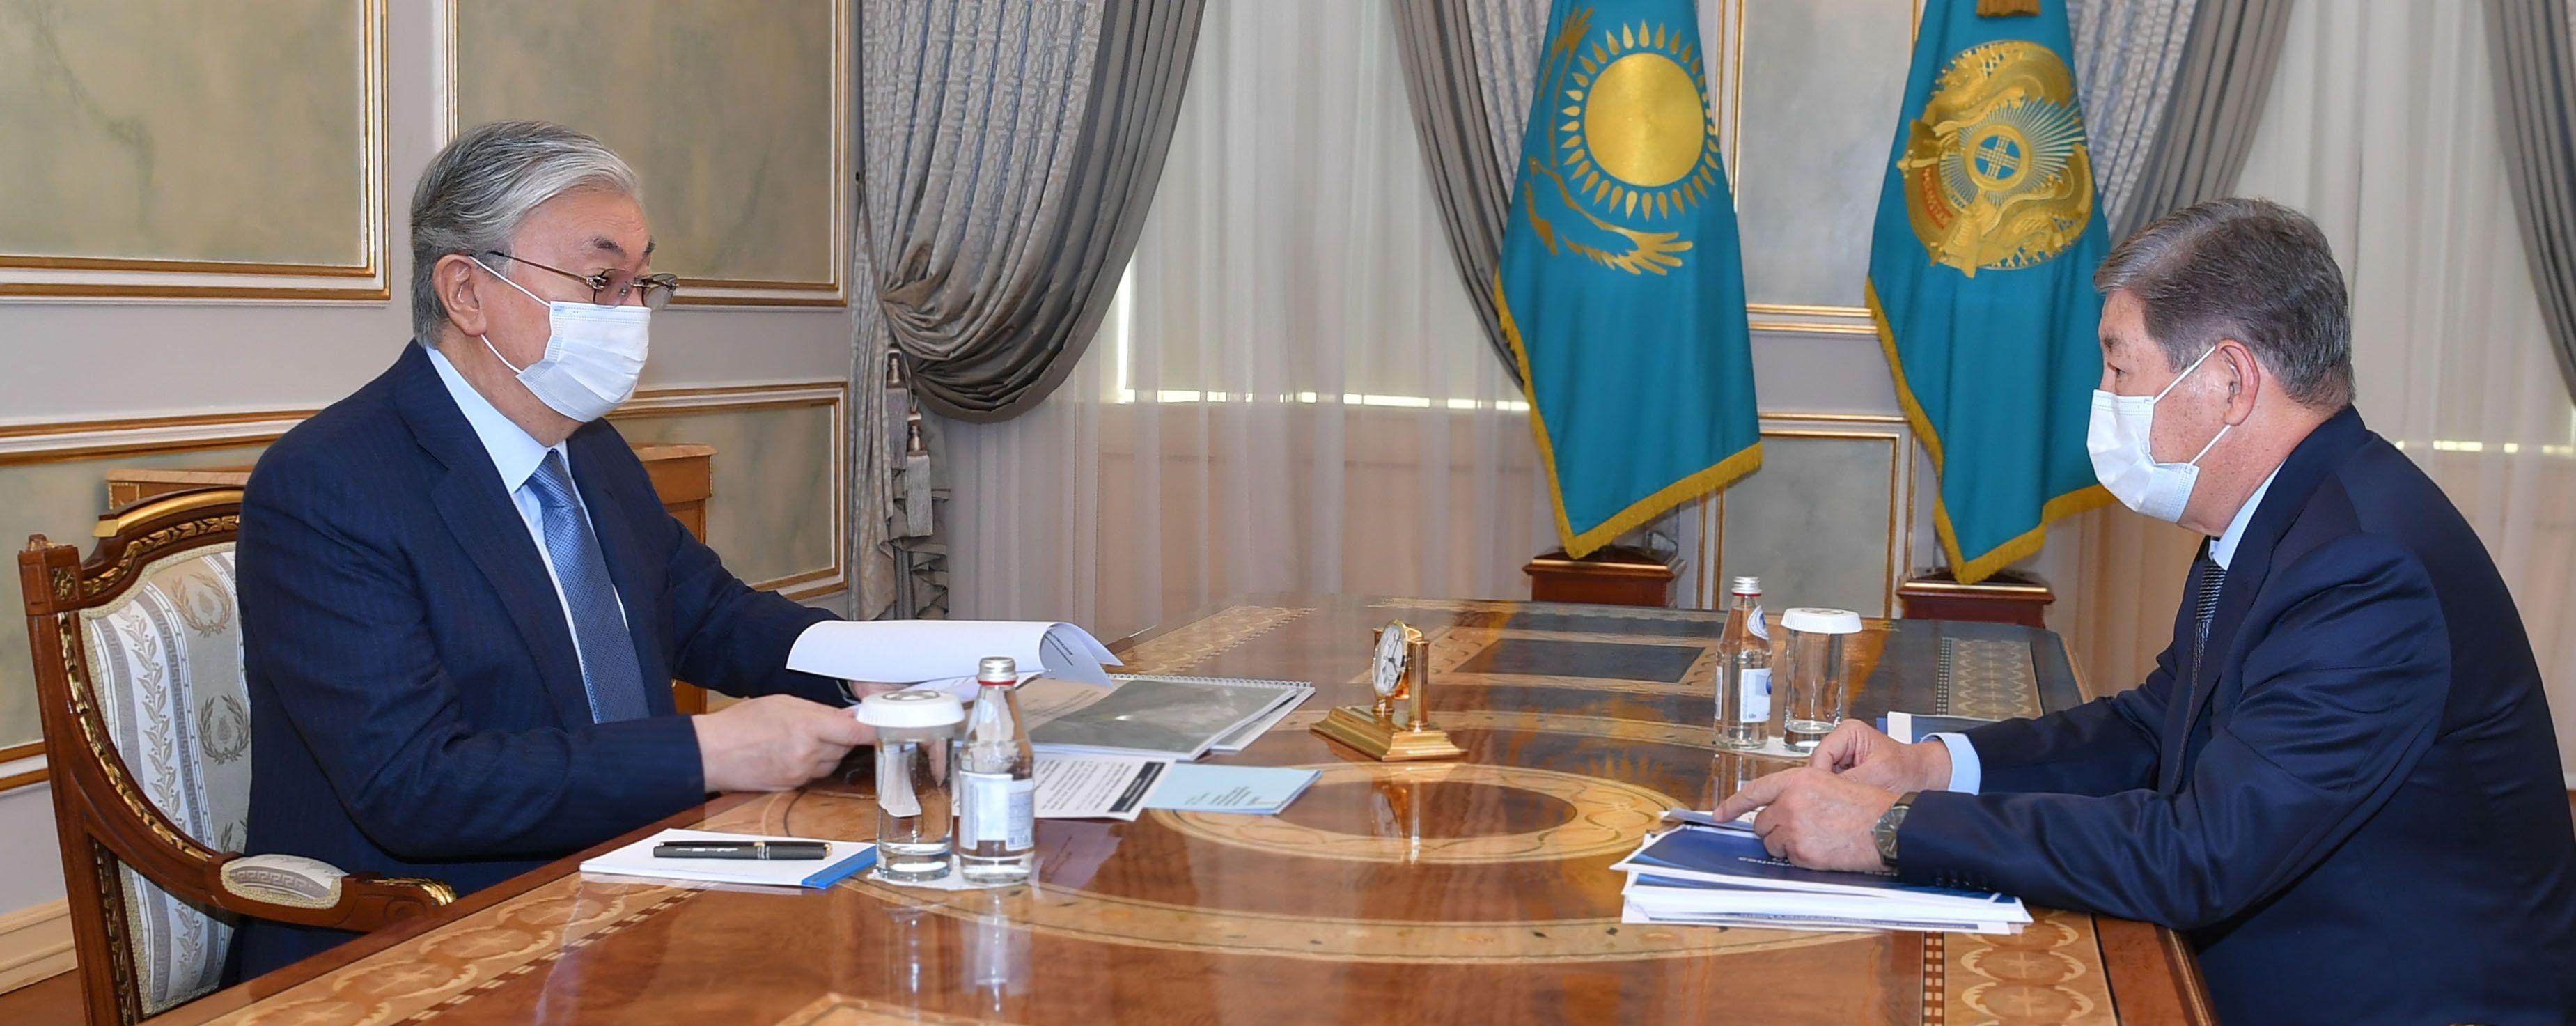 «Самрук-Казына» погасил займы на 554 млрд тенге- Kapital.kz